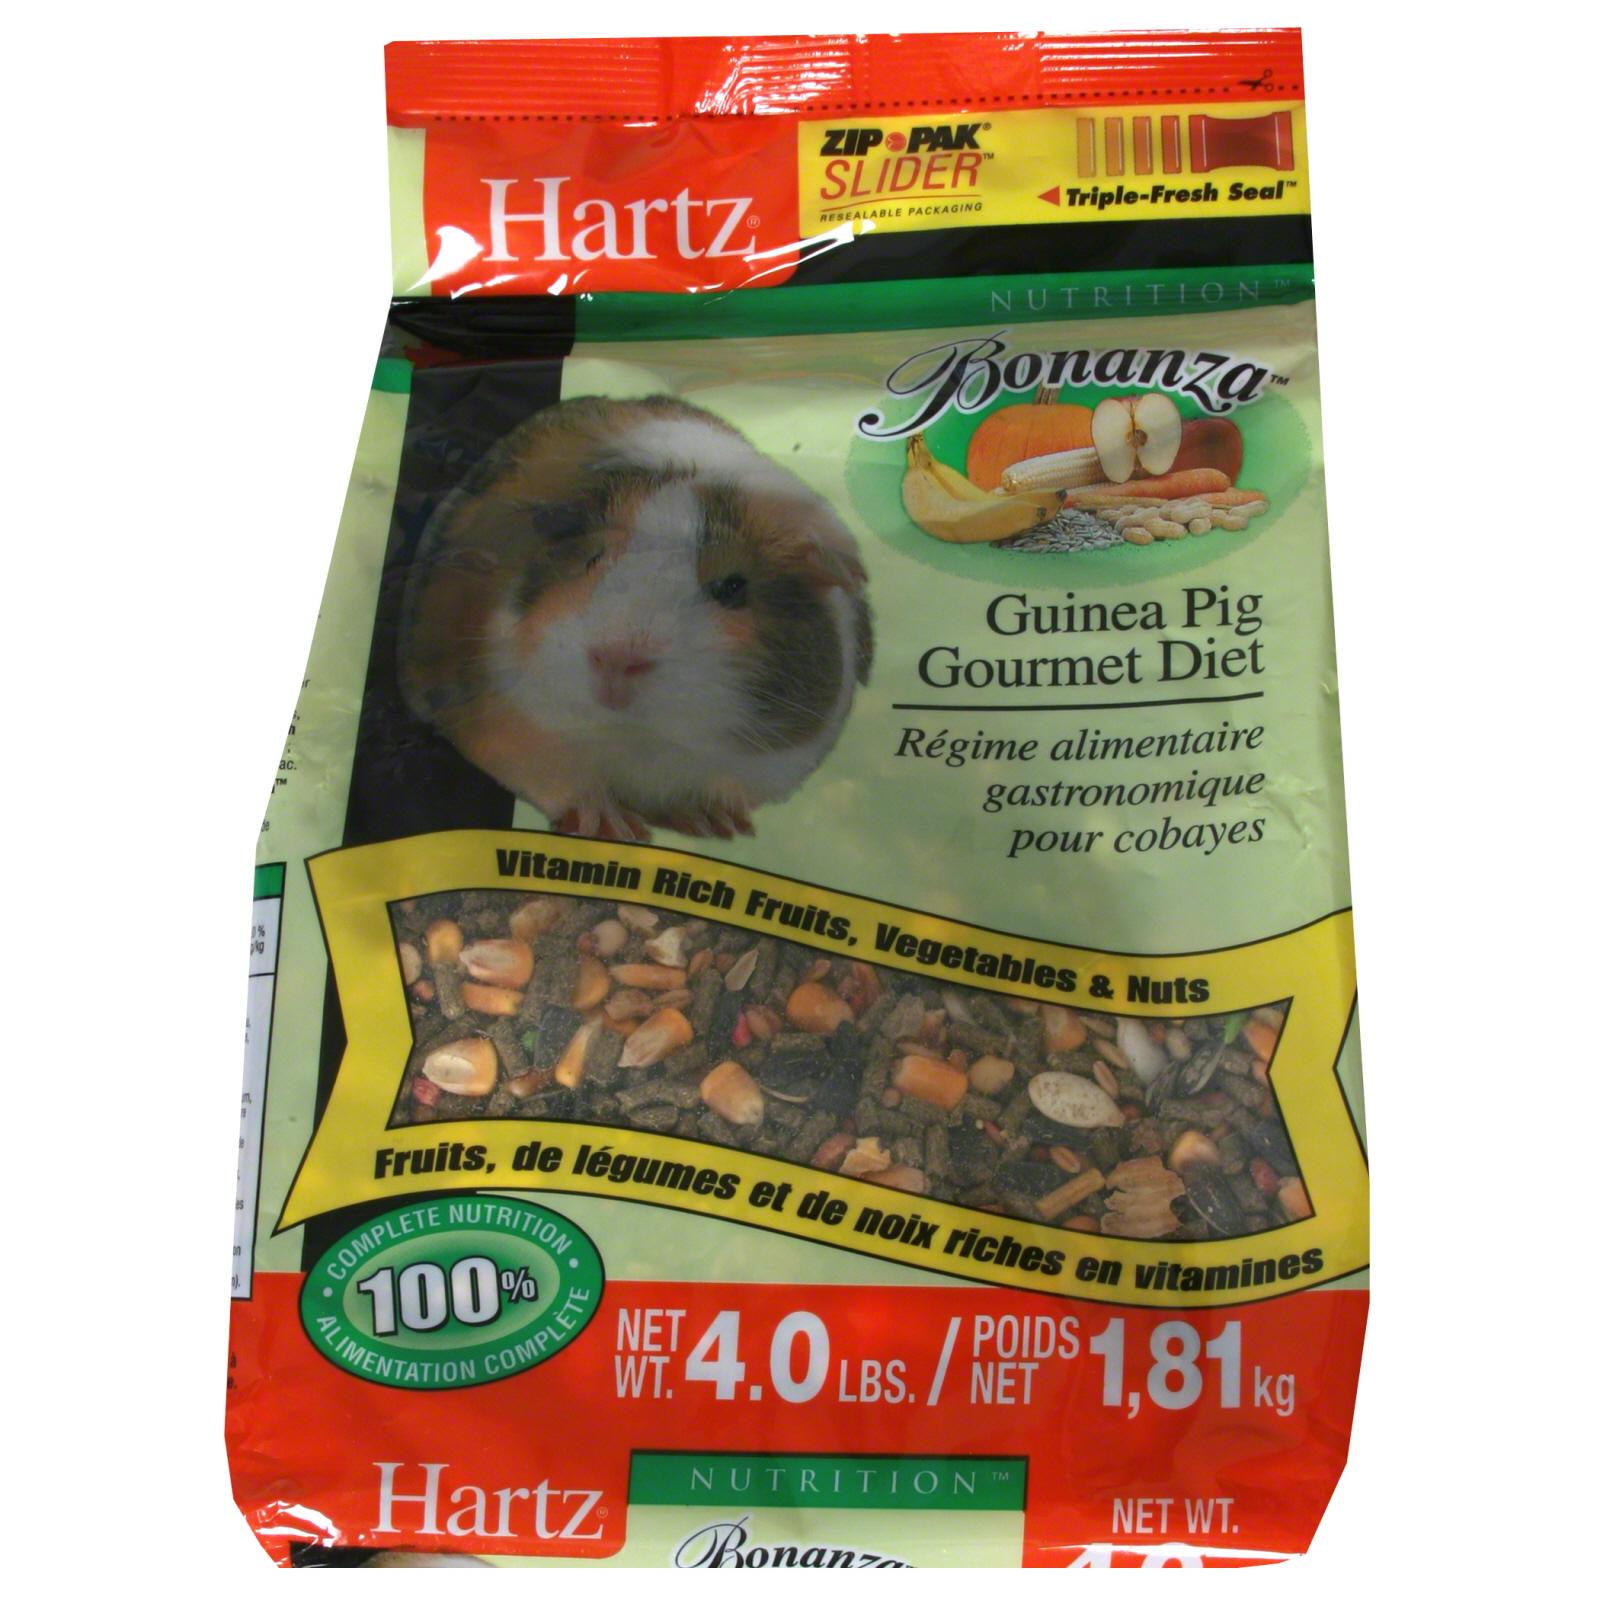 Hartz Nutrition Bonanza Guinea Pig Gourmet Diet 4 lb 1